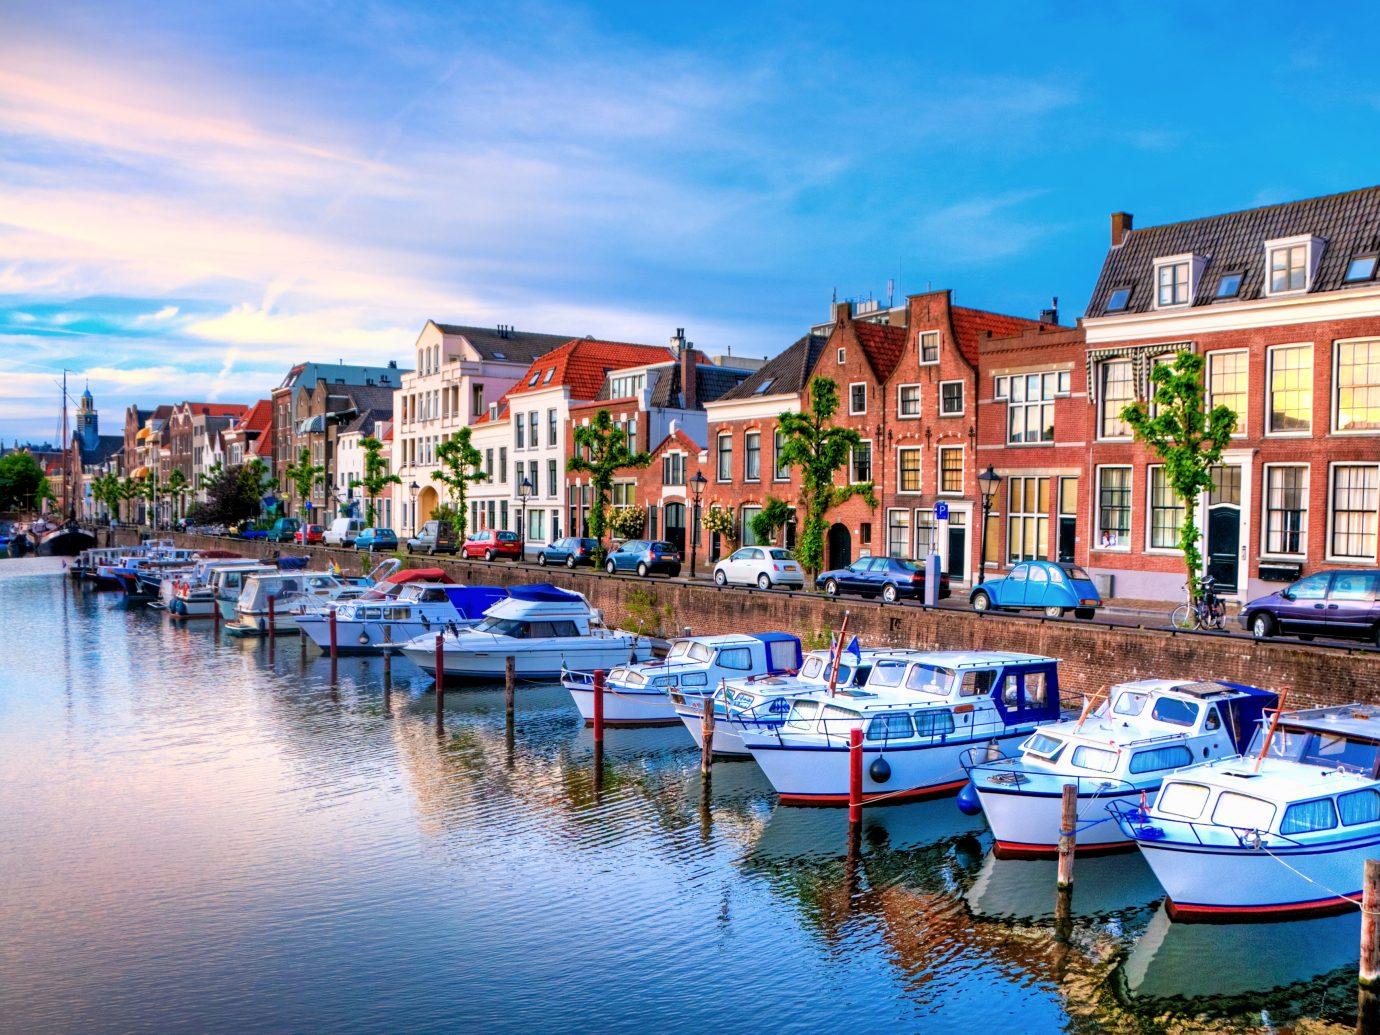 Historic cityscape along a channel in Delfshaven, a district of Rotterdam